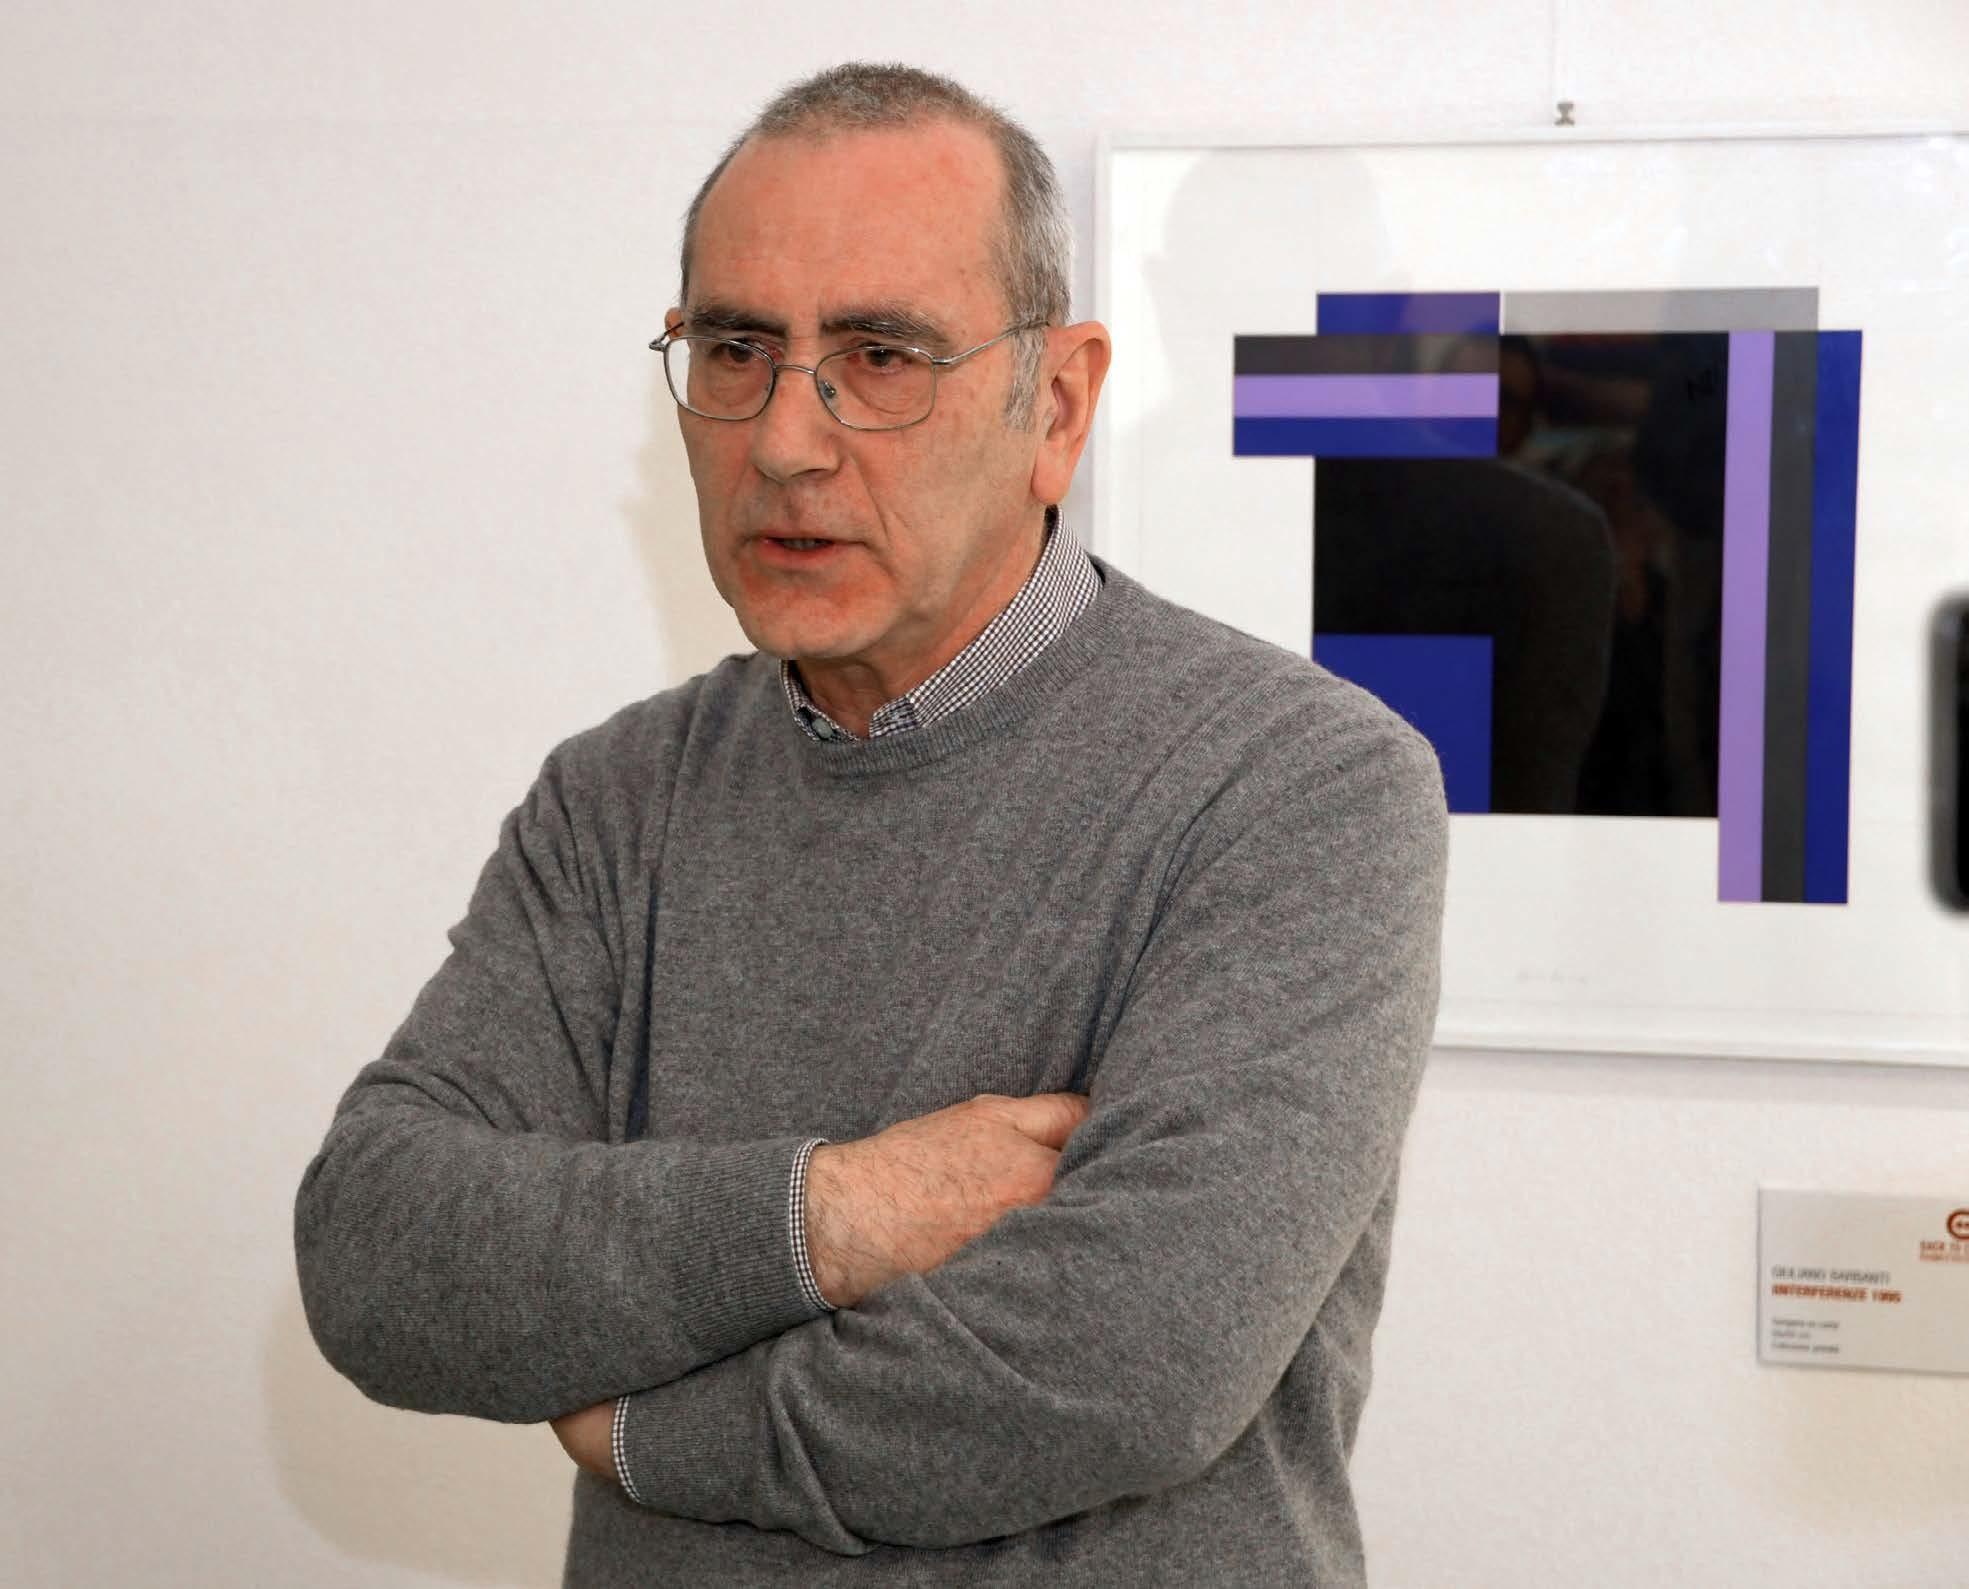 Ernesto Jiannini Back to College Pavia